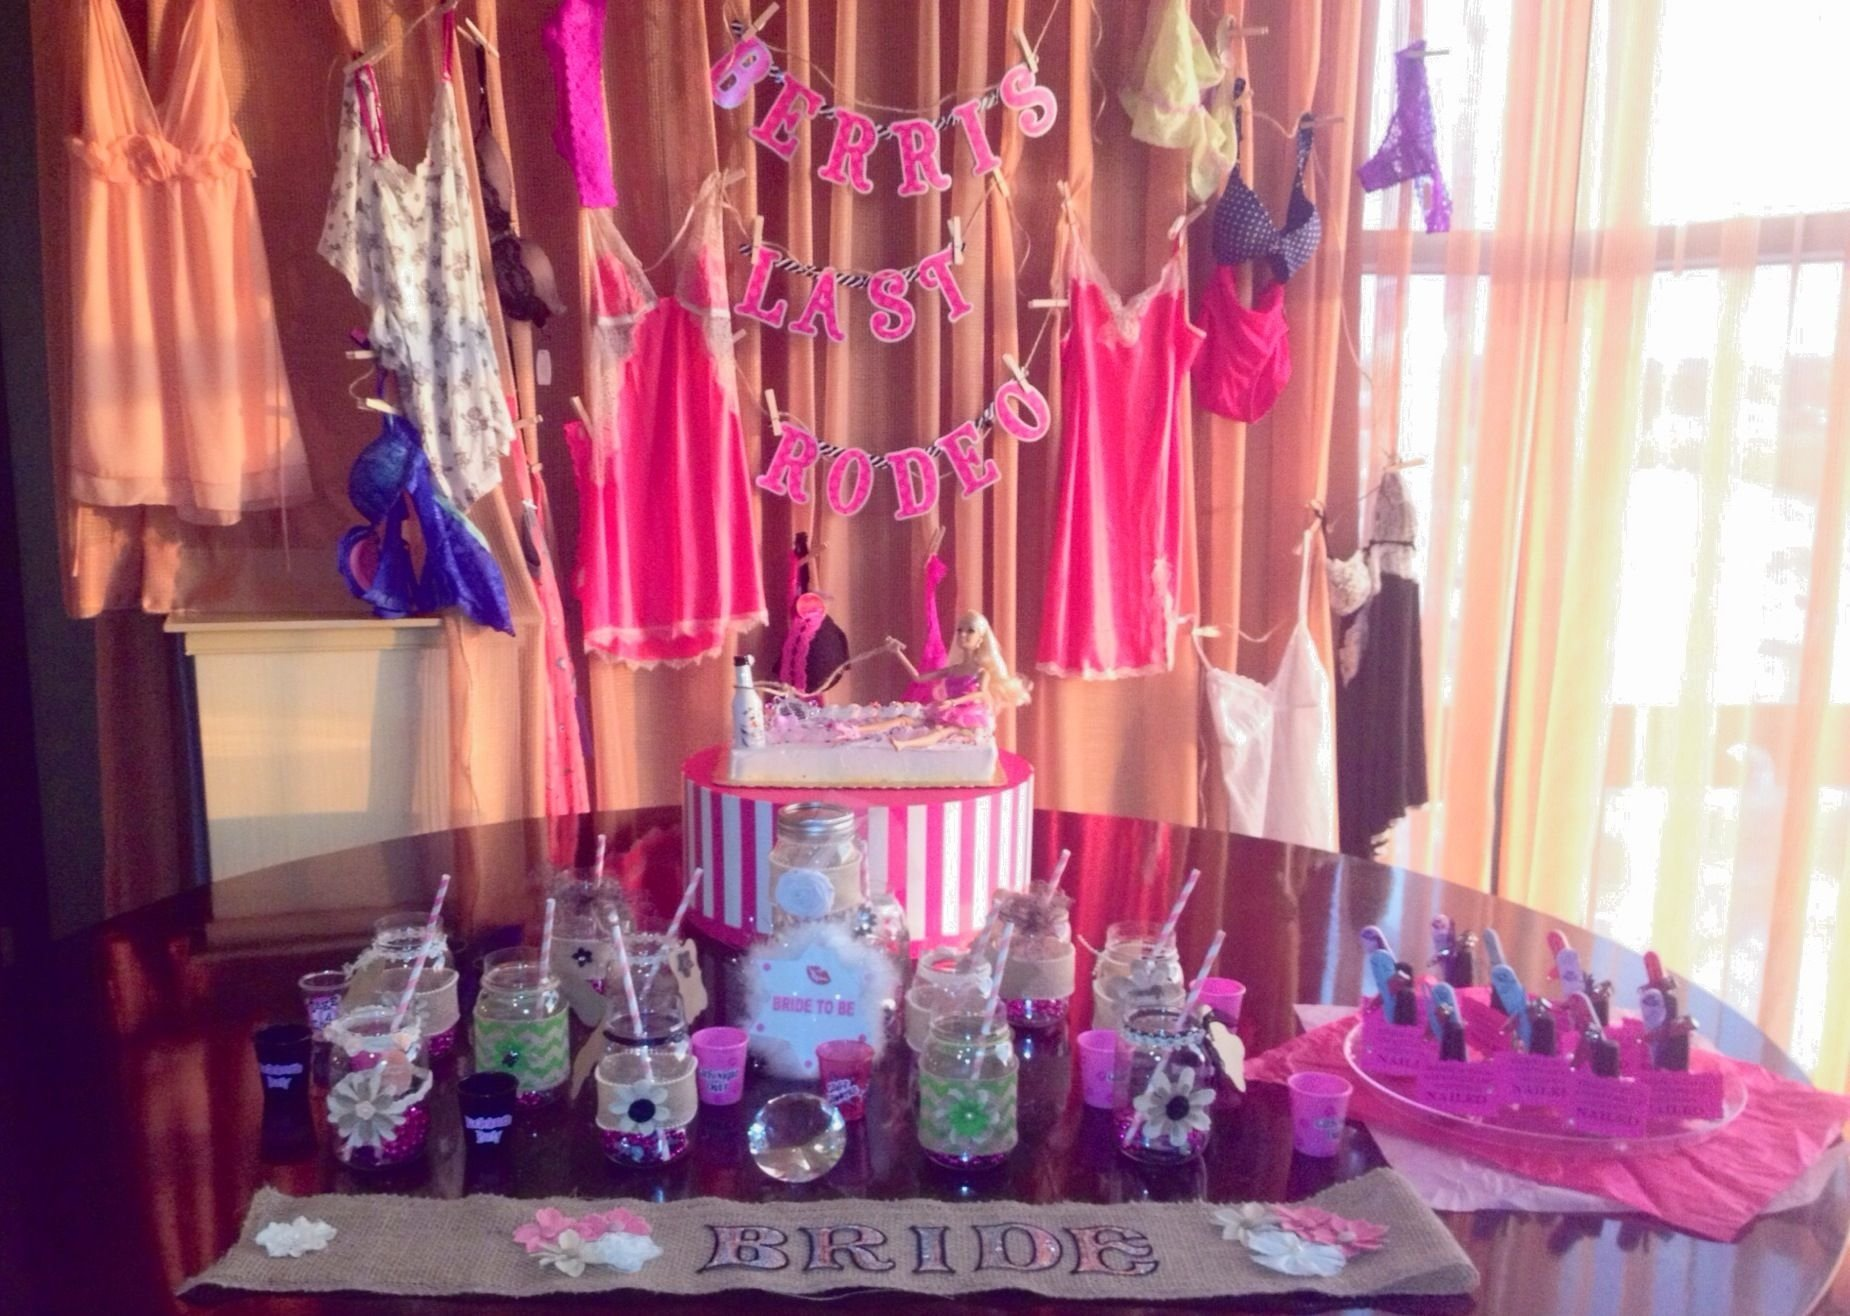 10 Stunning Bachelor Party Ideas Las Vegas last rodeo bachelorette party theme party decor and ideas 1 2020